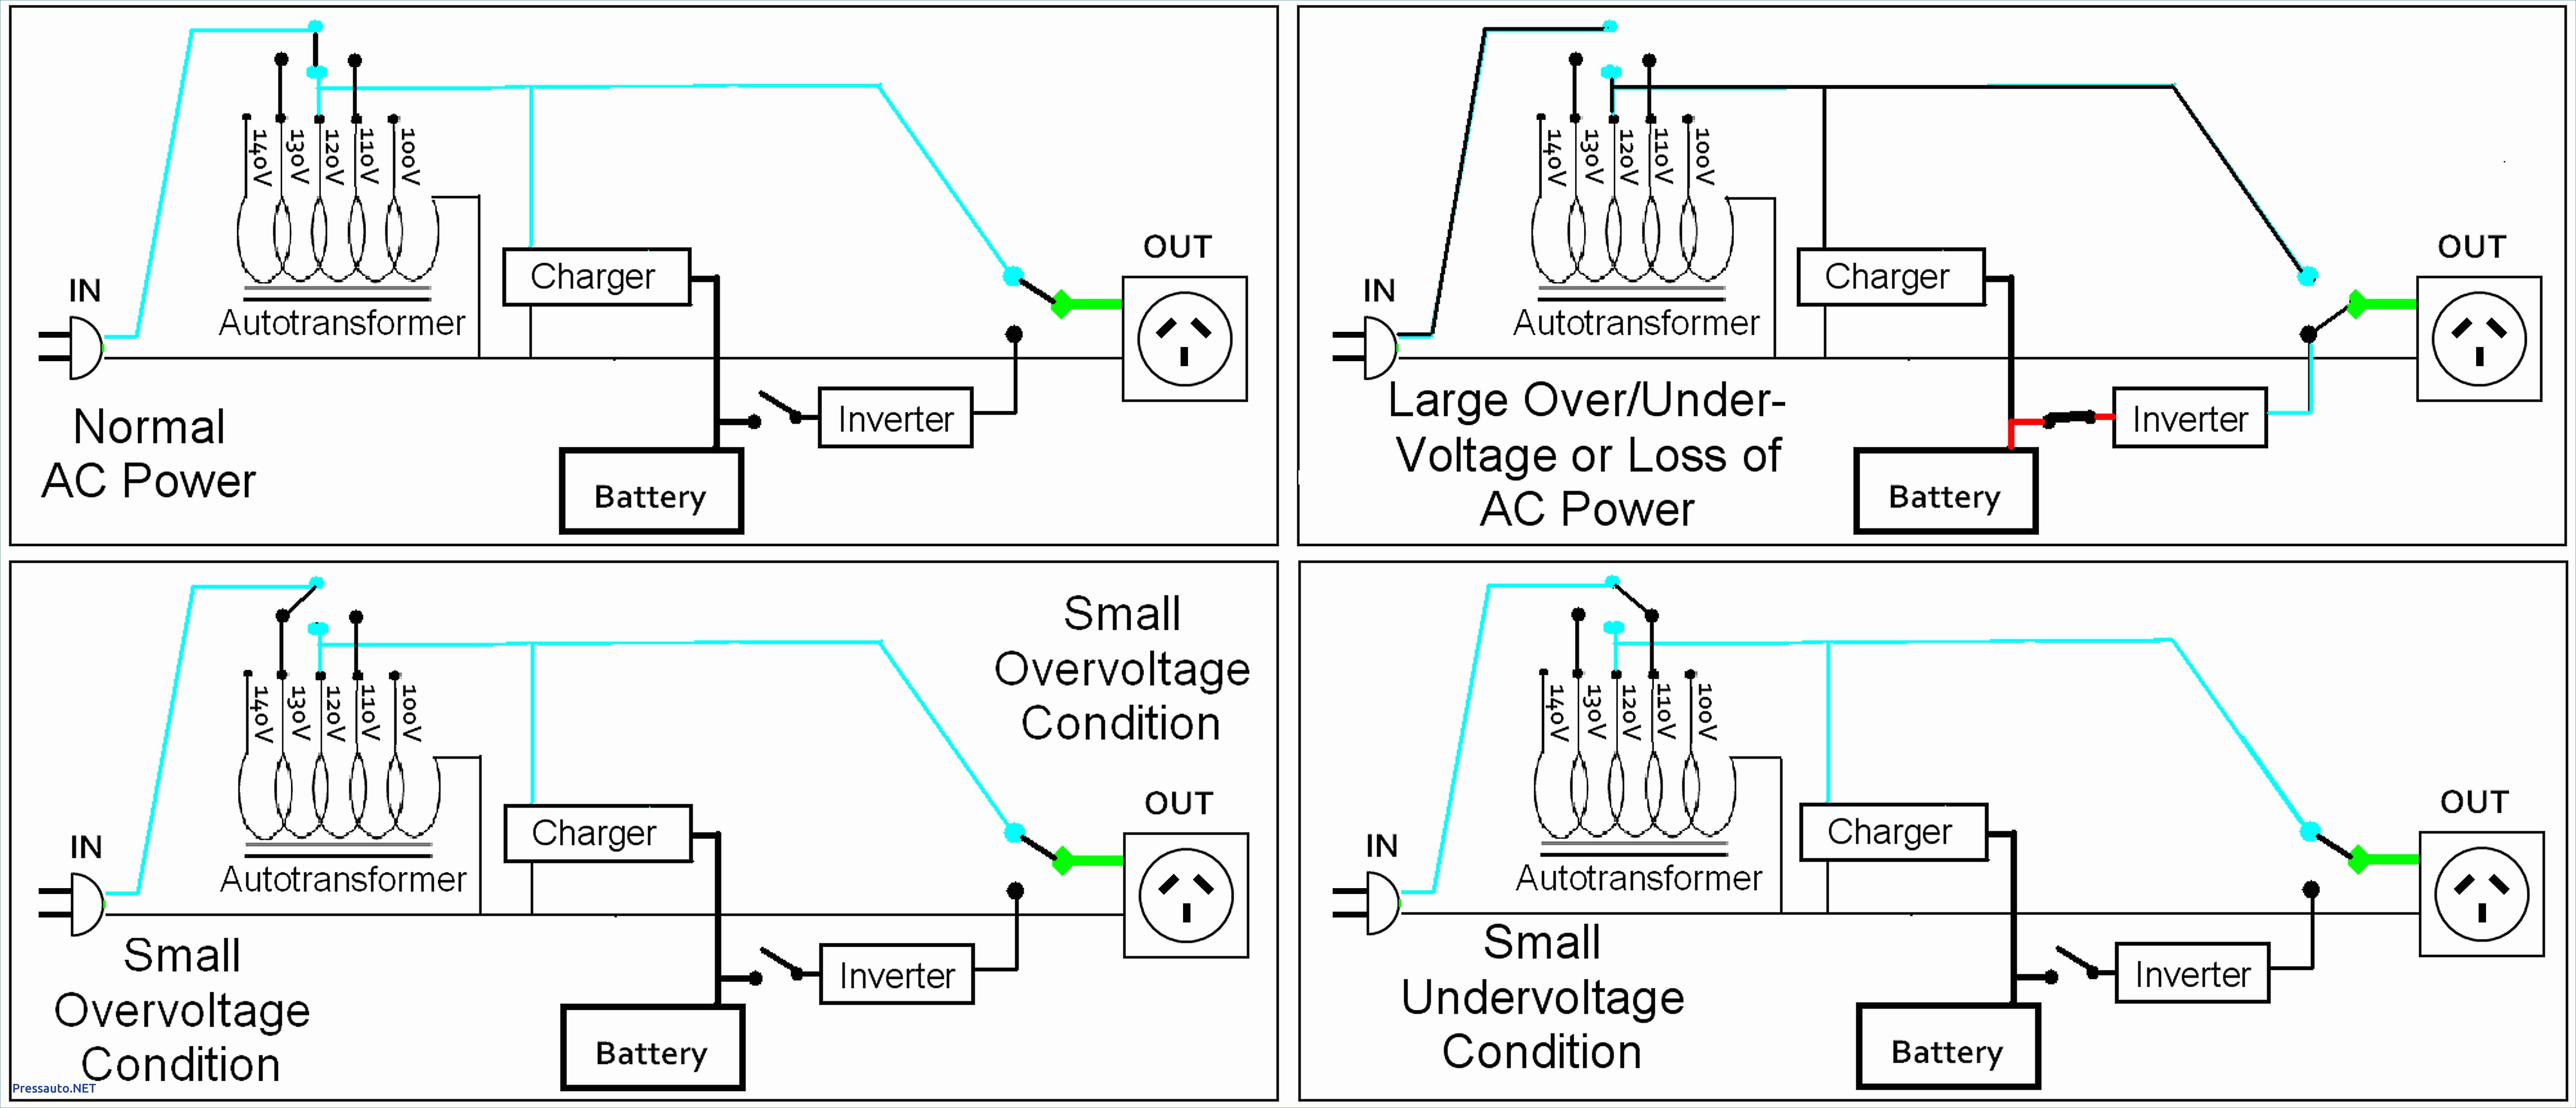 480V Transformer Wiring Diagram 12V | Wiring Diagram - 480V To 120V Transformer Wiring Diagram